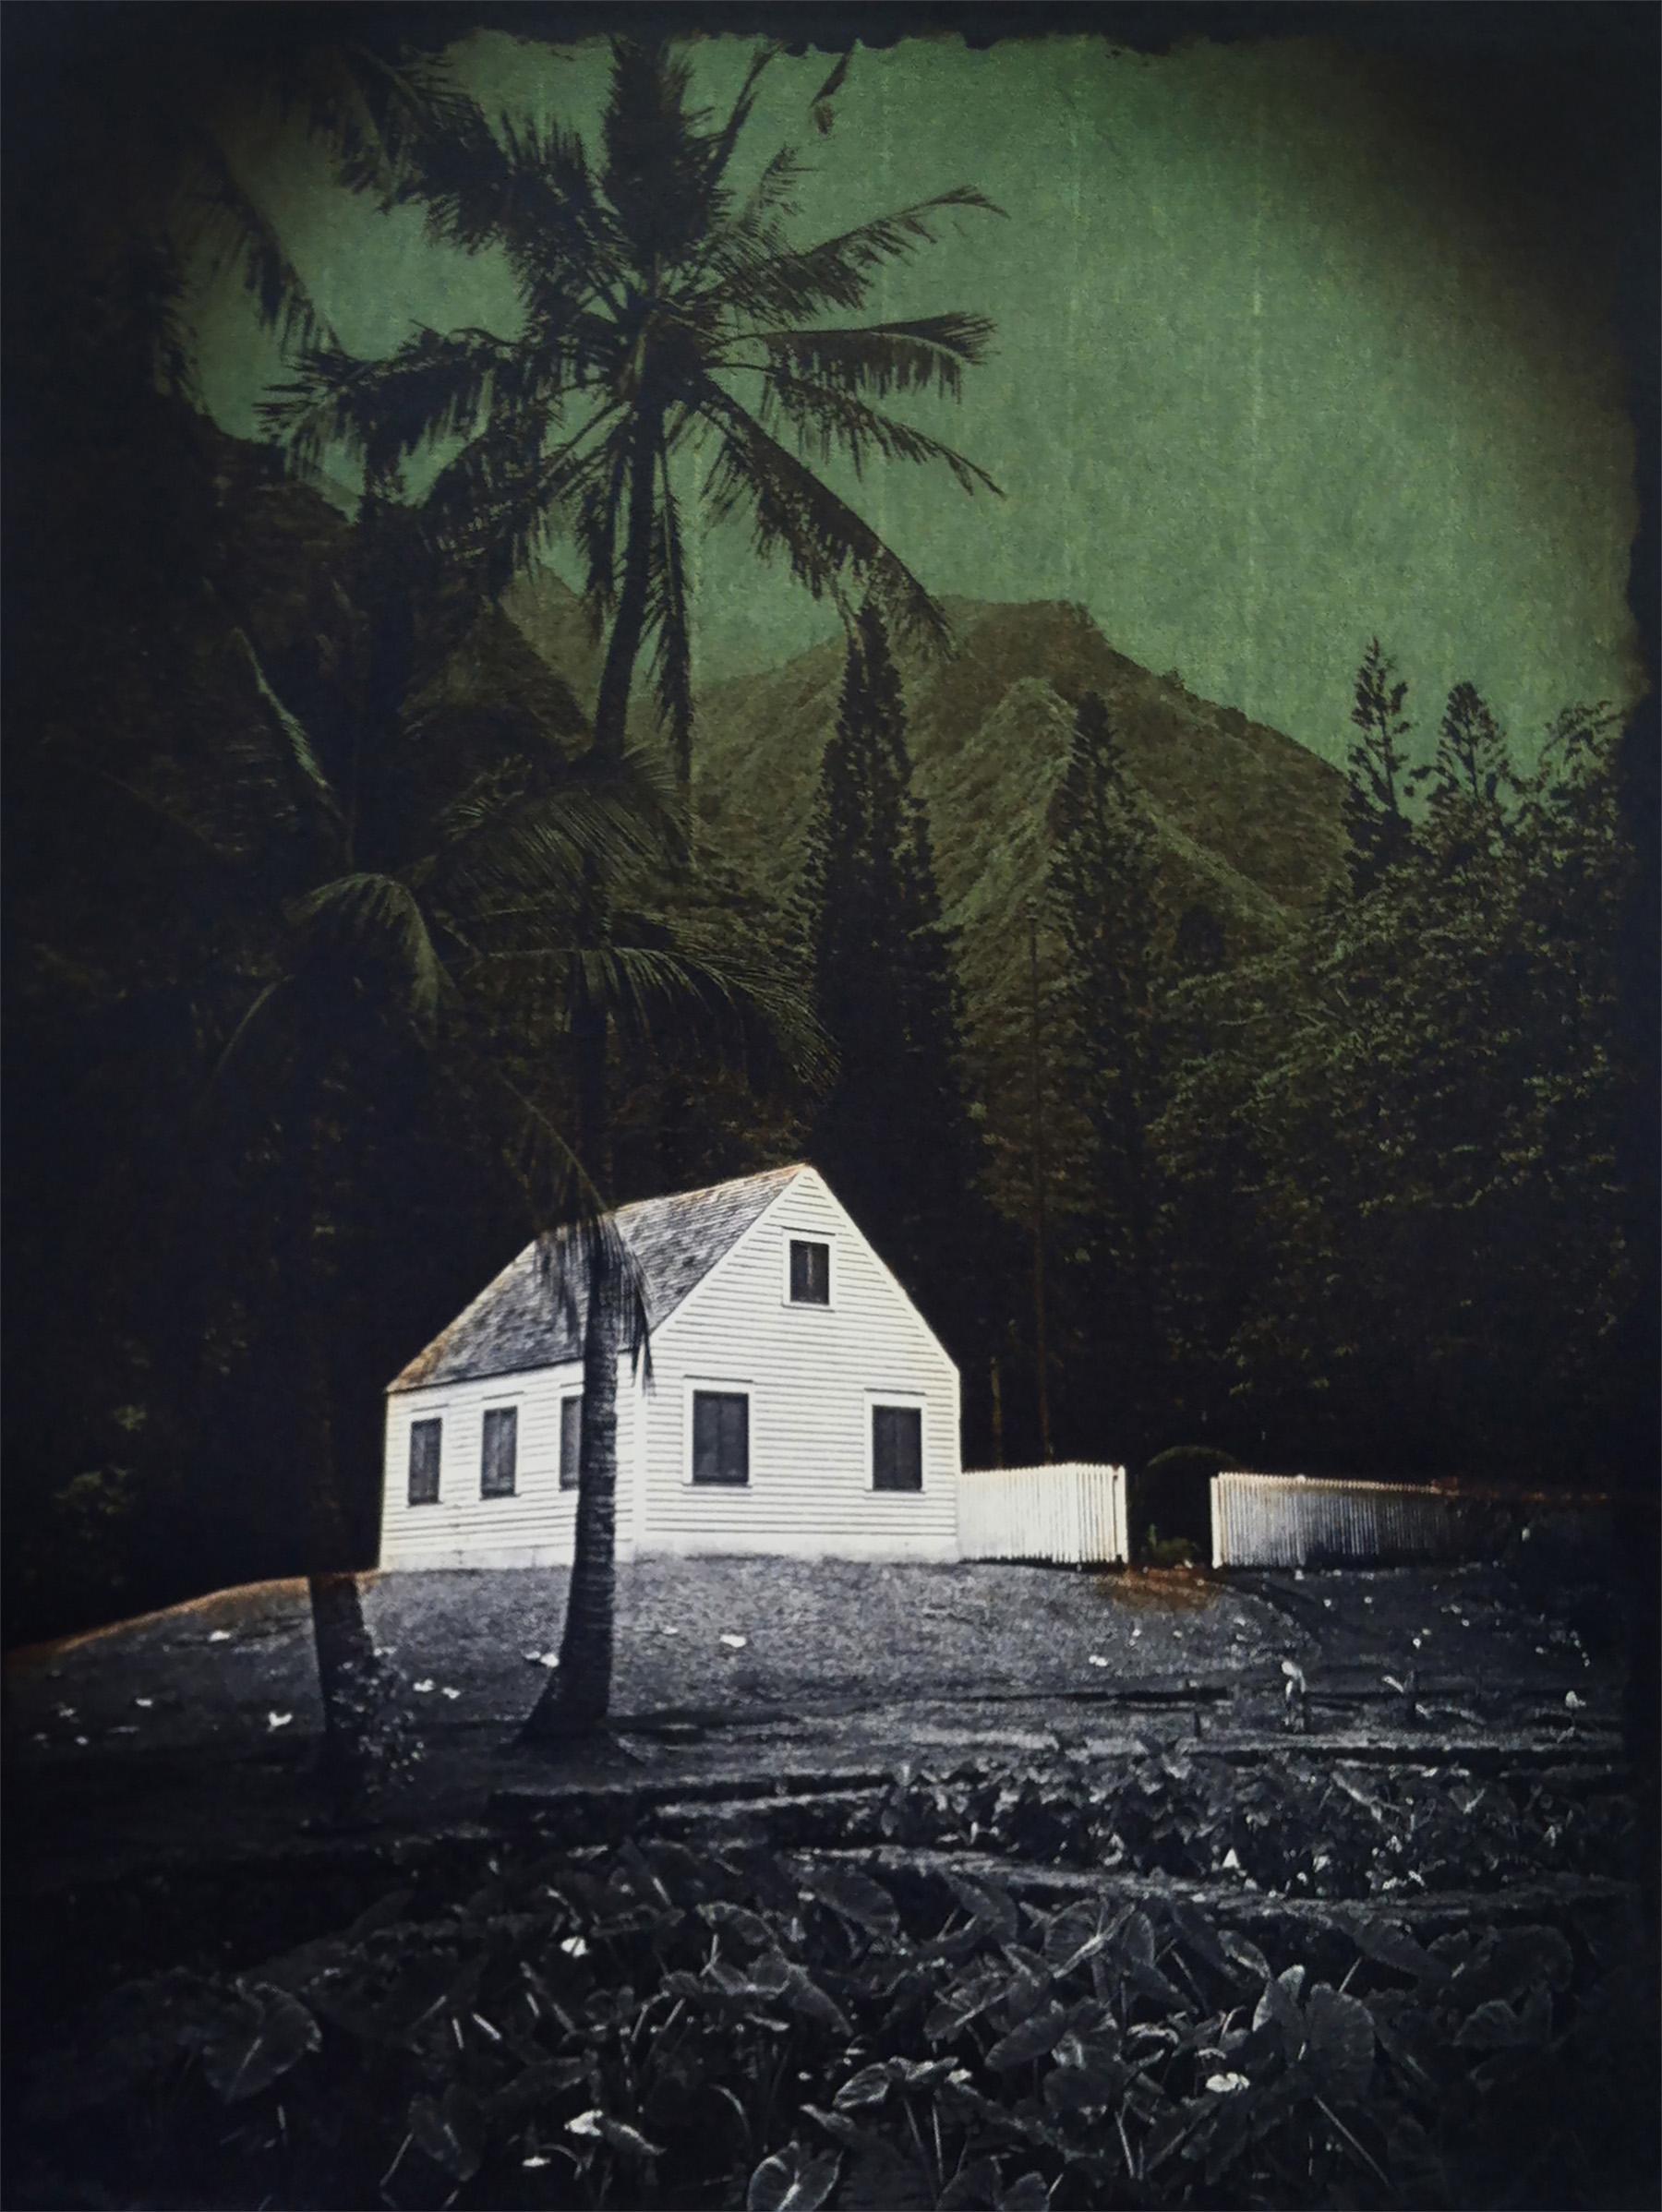 Iao Valley, Maui